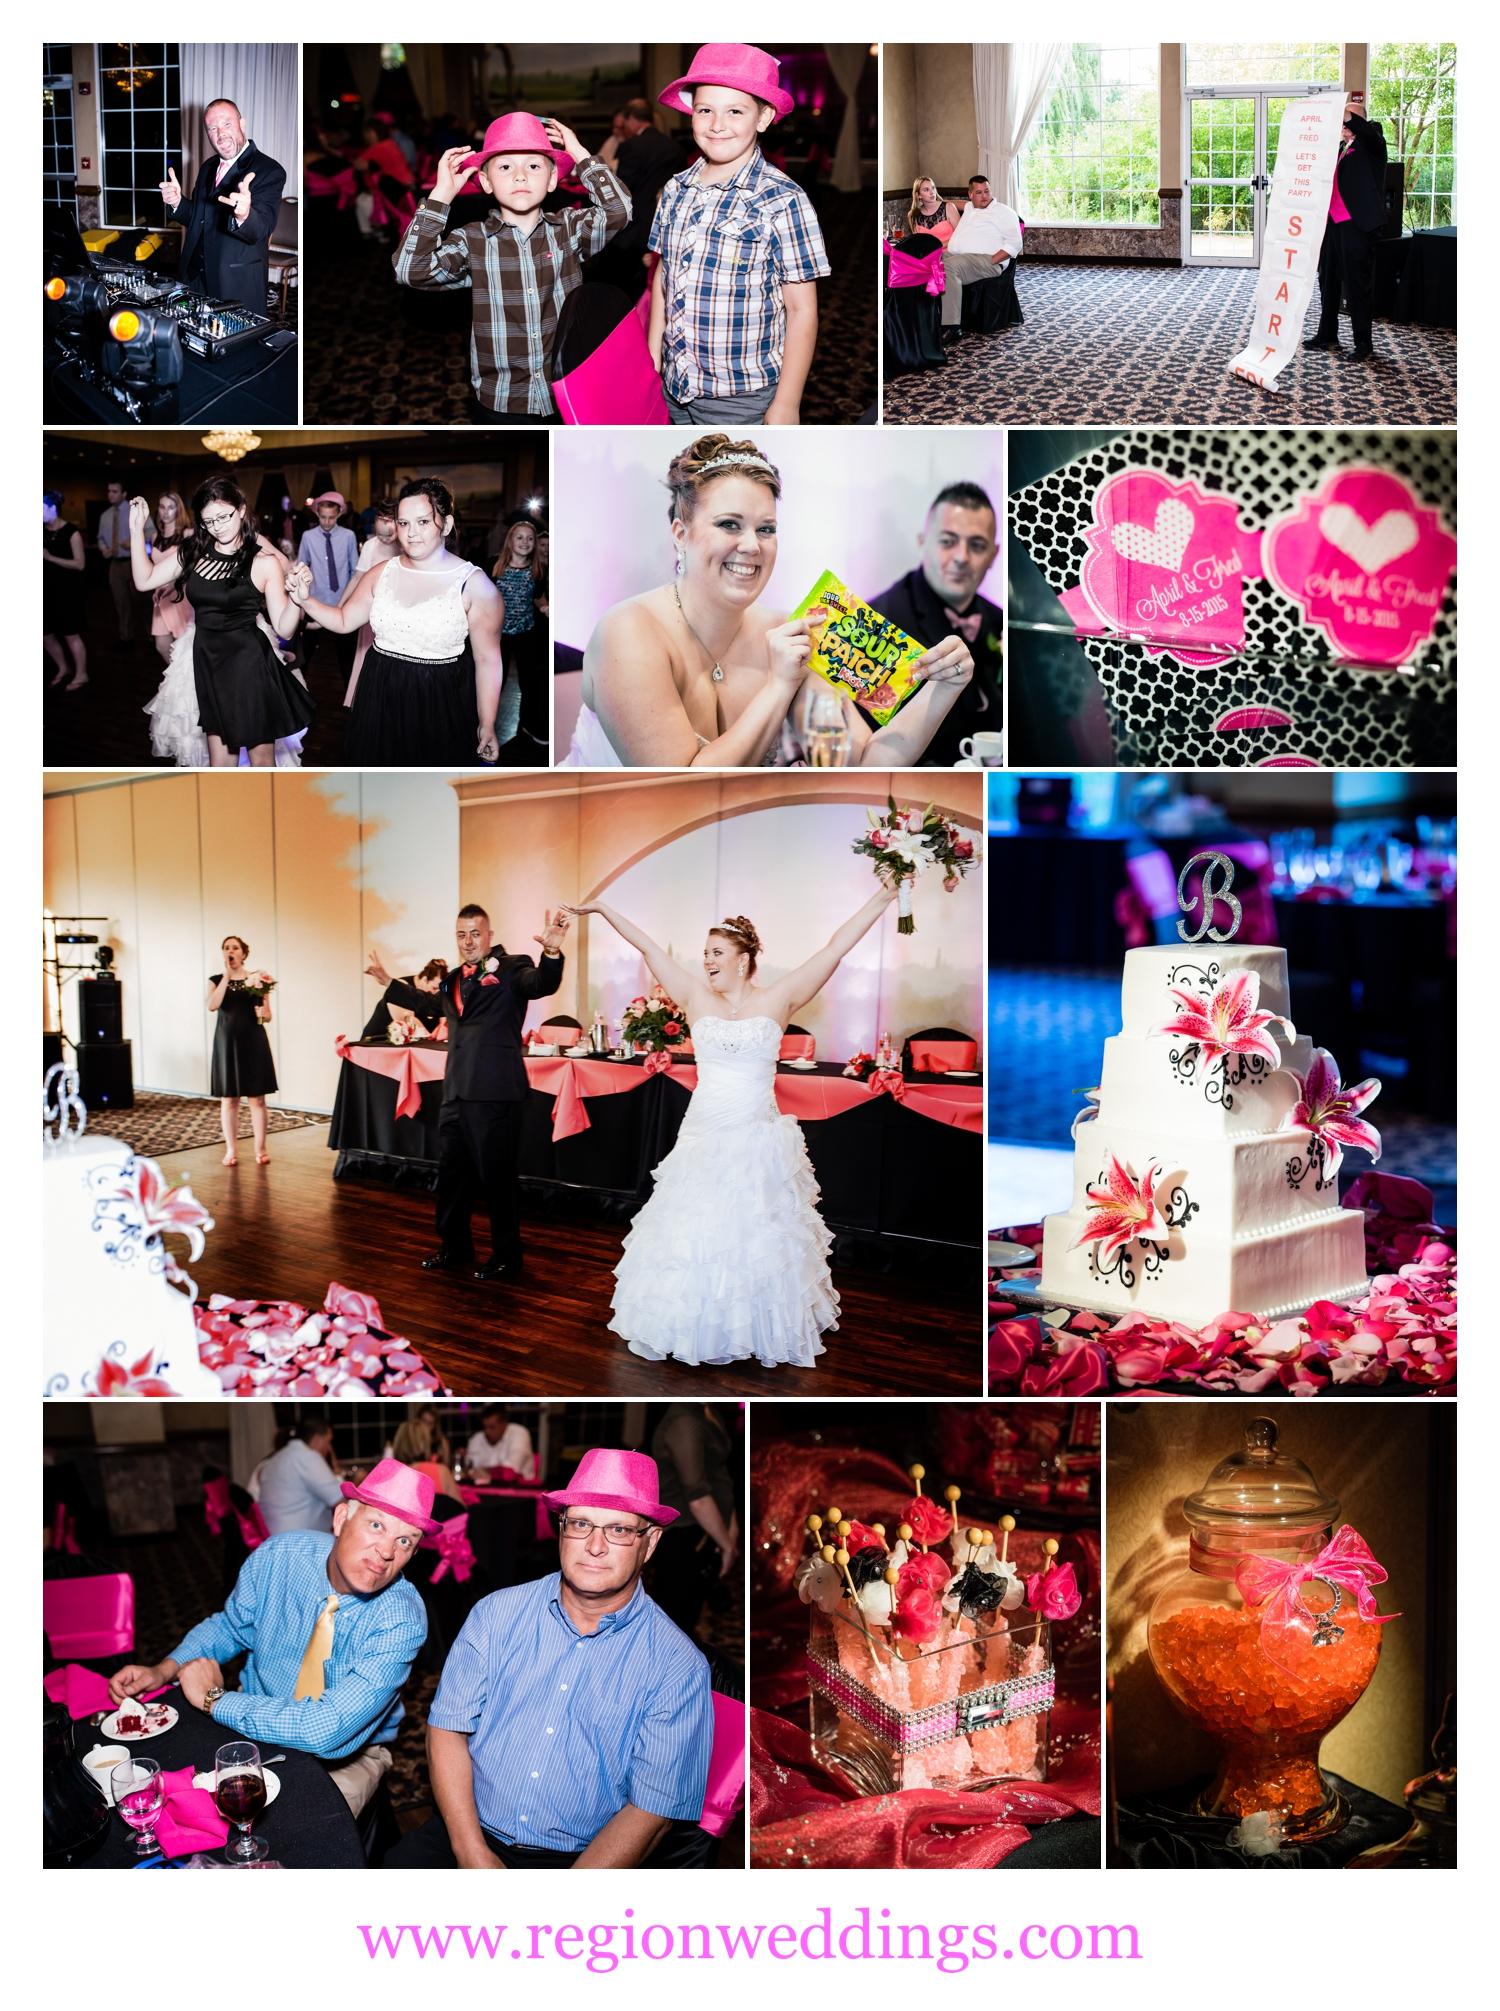 Wedding reception at Avalon Manor in Merrillville, Indiana.